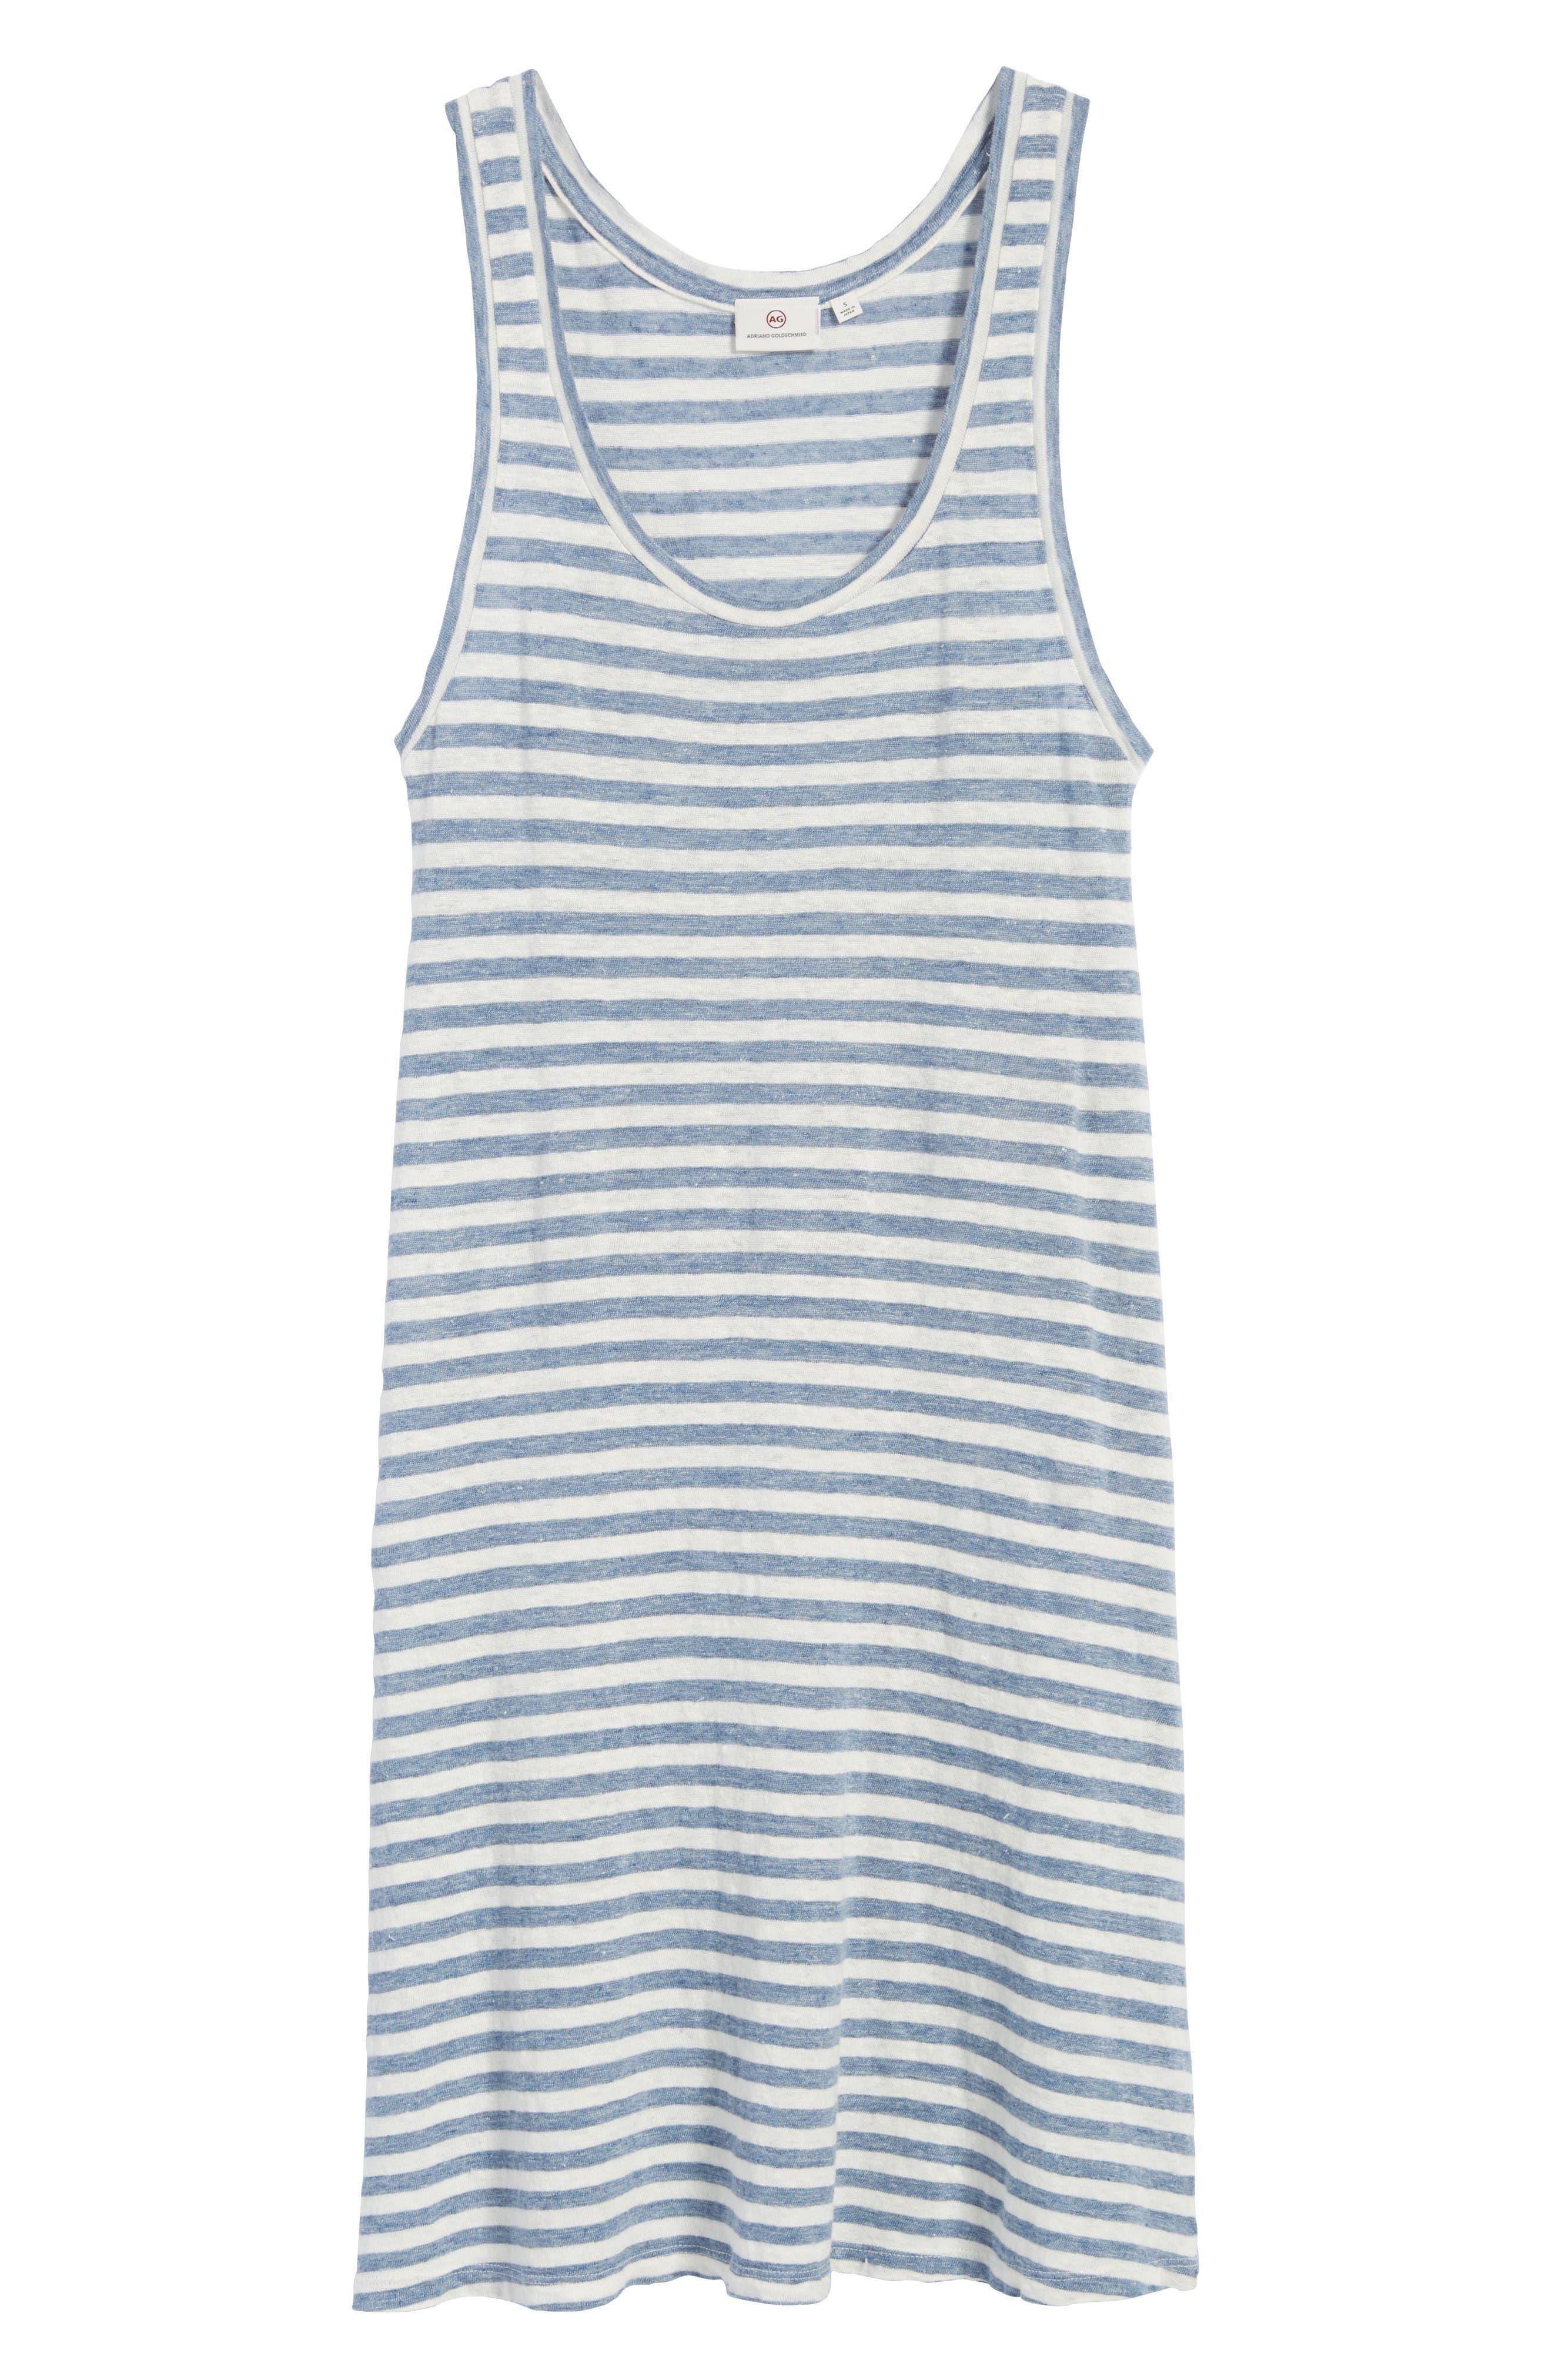 Avril Linen Tank Dress,                             Alternate thumbnail 6, color,                             Heather Blue/ Powder White